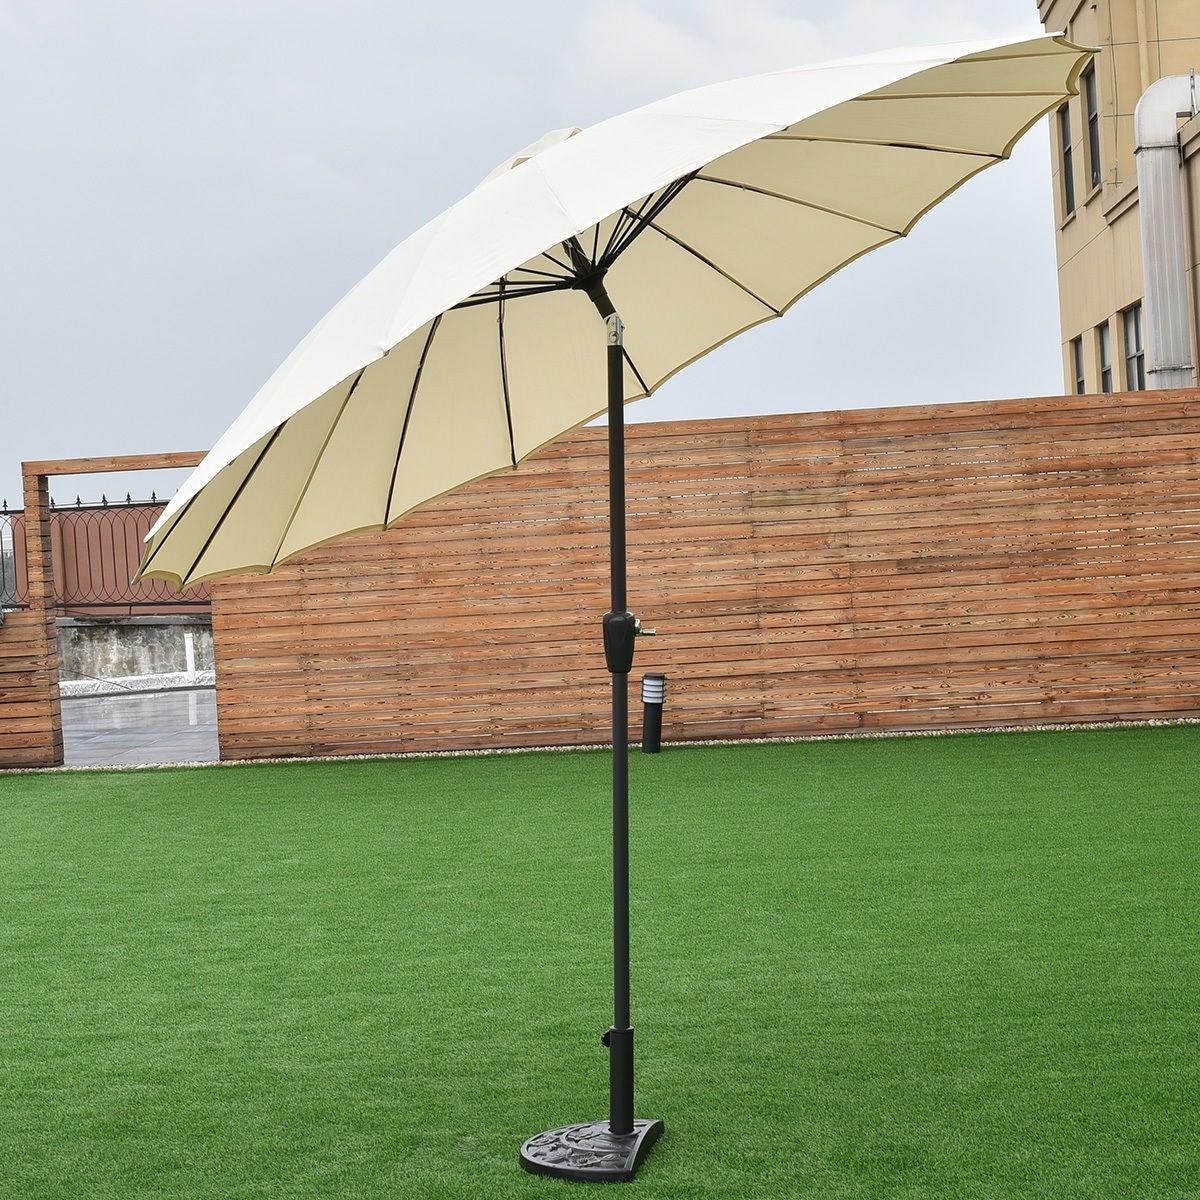 Costway Outdoor 9ft Patio Umbrella Sunshade Cover Market Garden Cafe ...